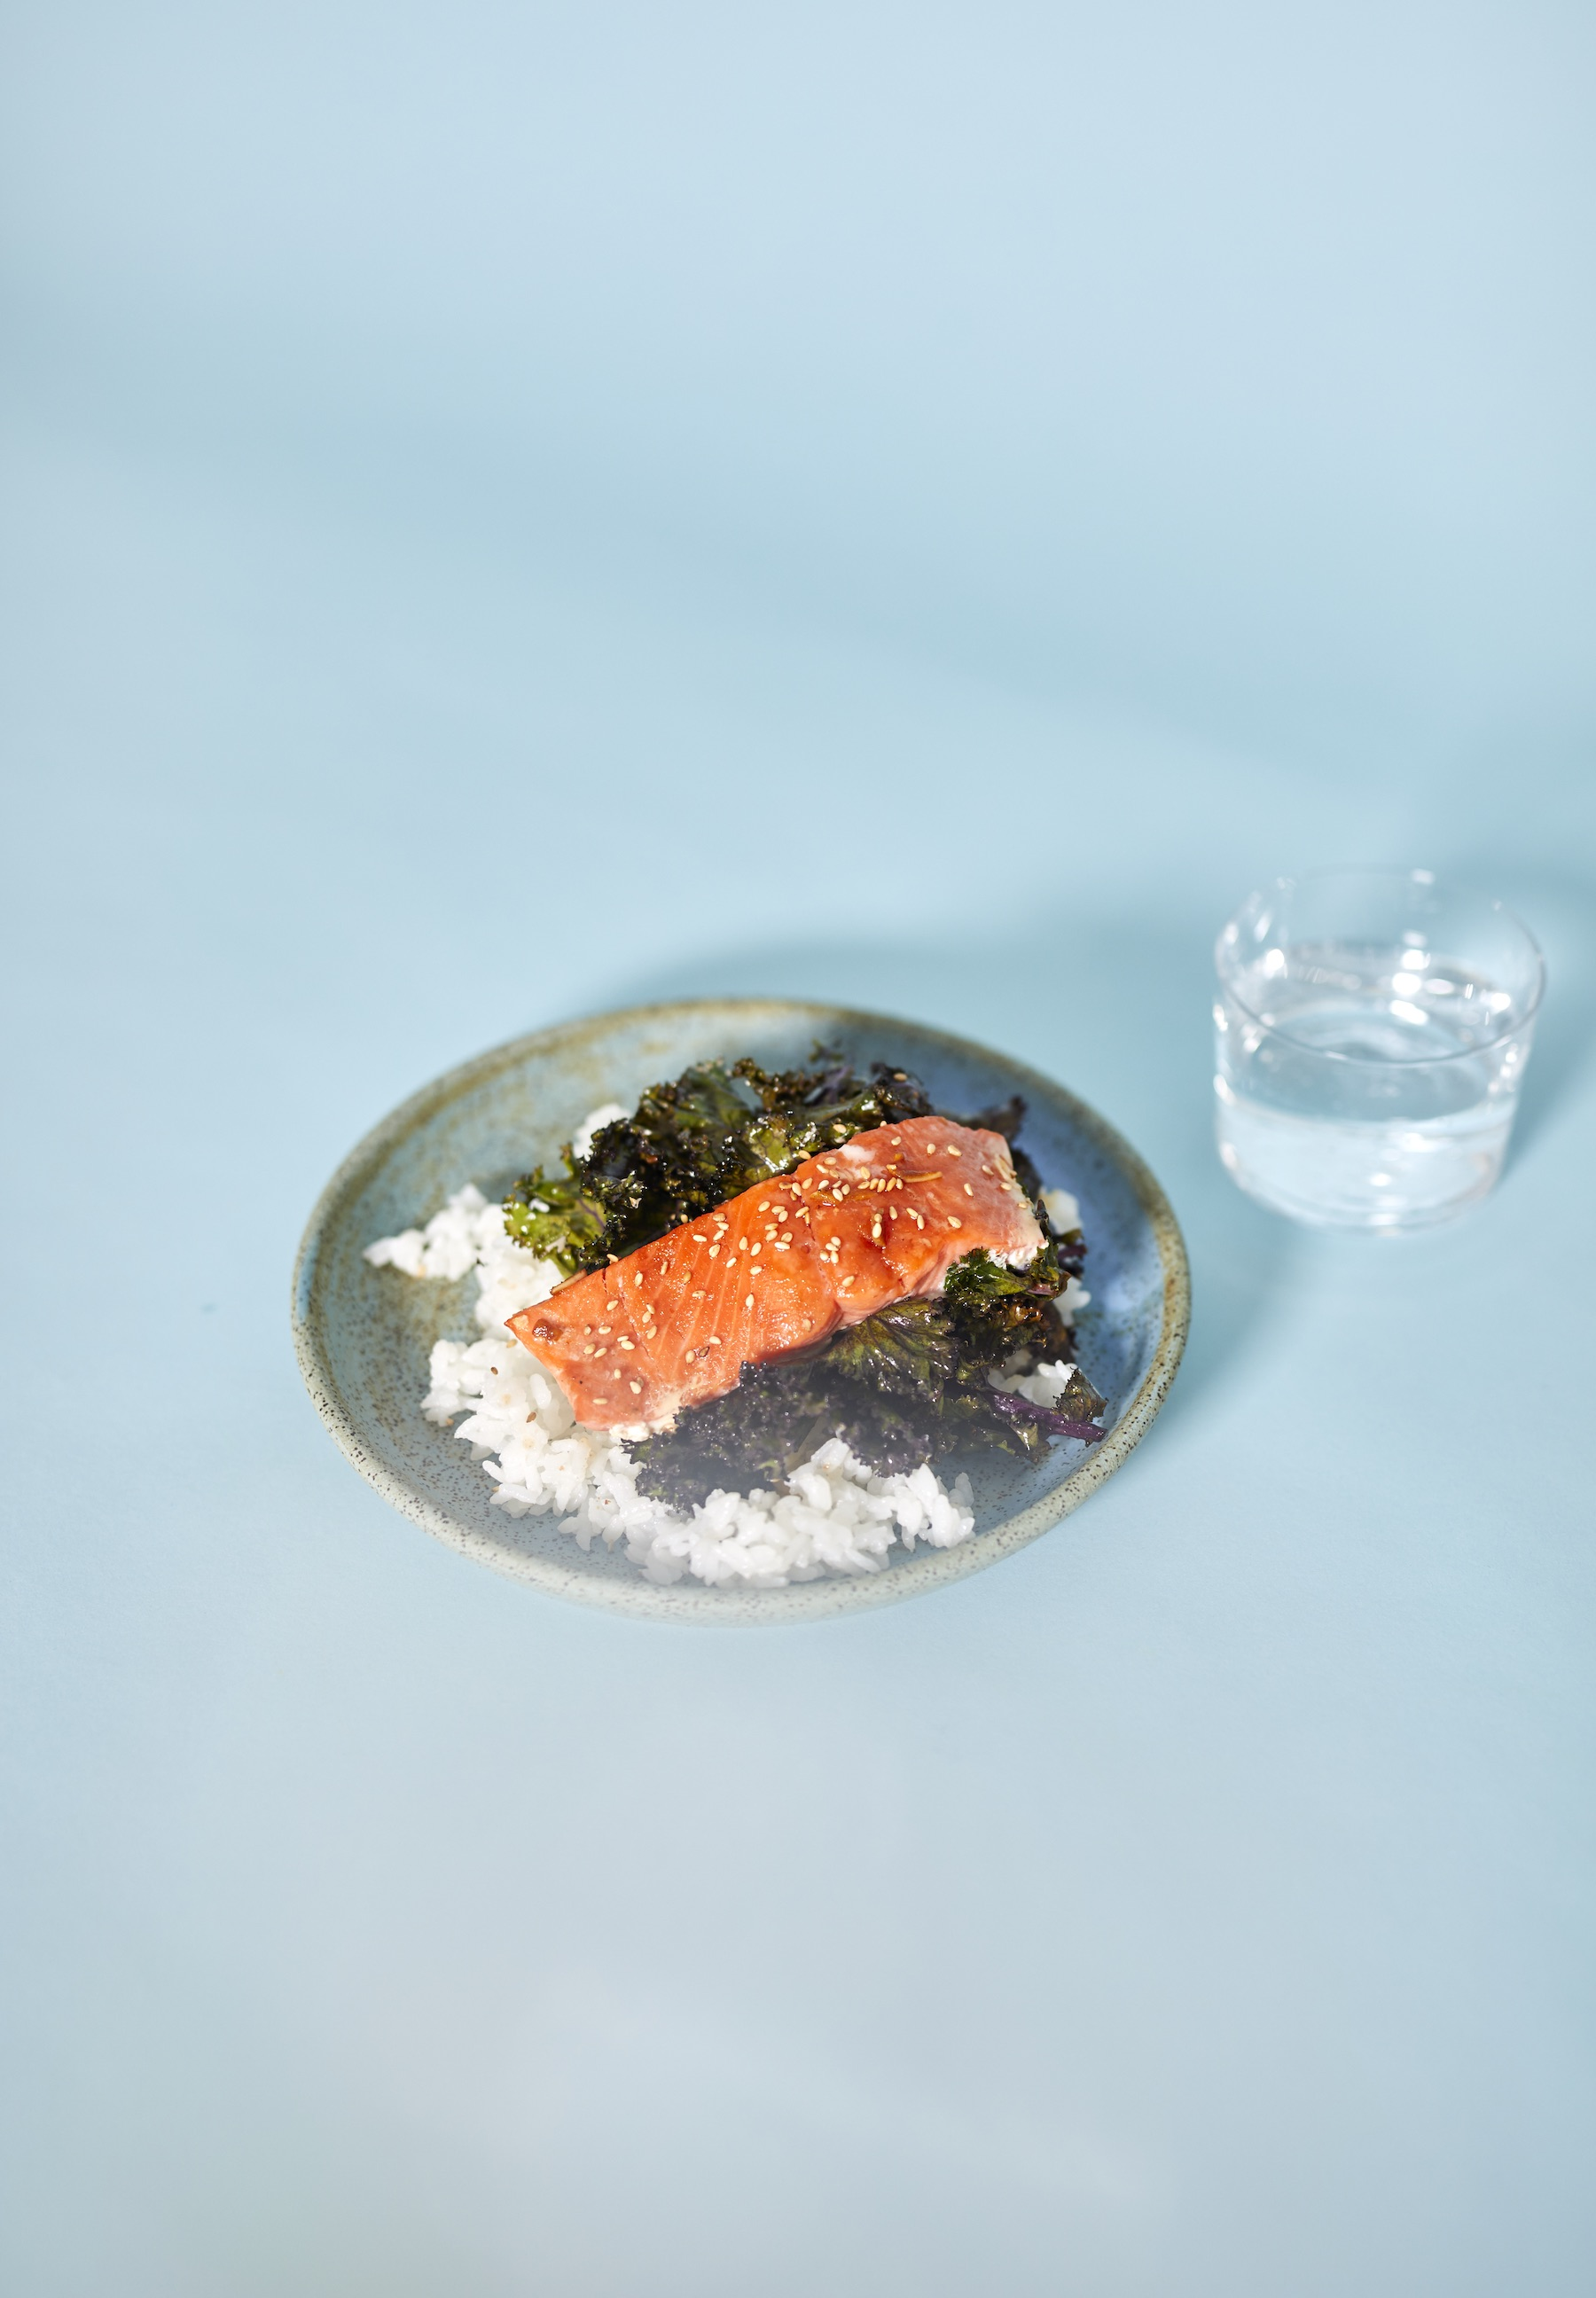 Afton's-salmon-bowl-25.jpg